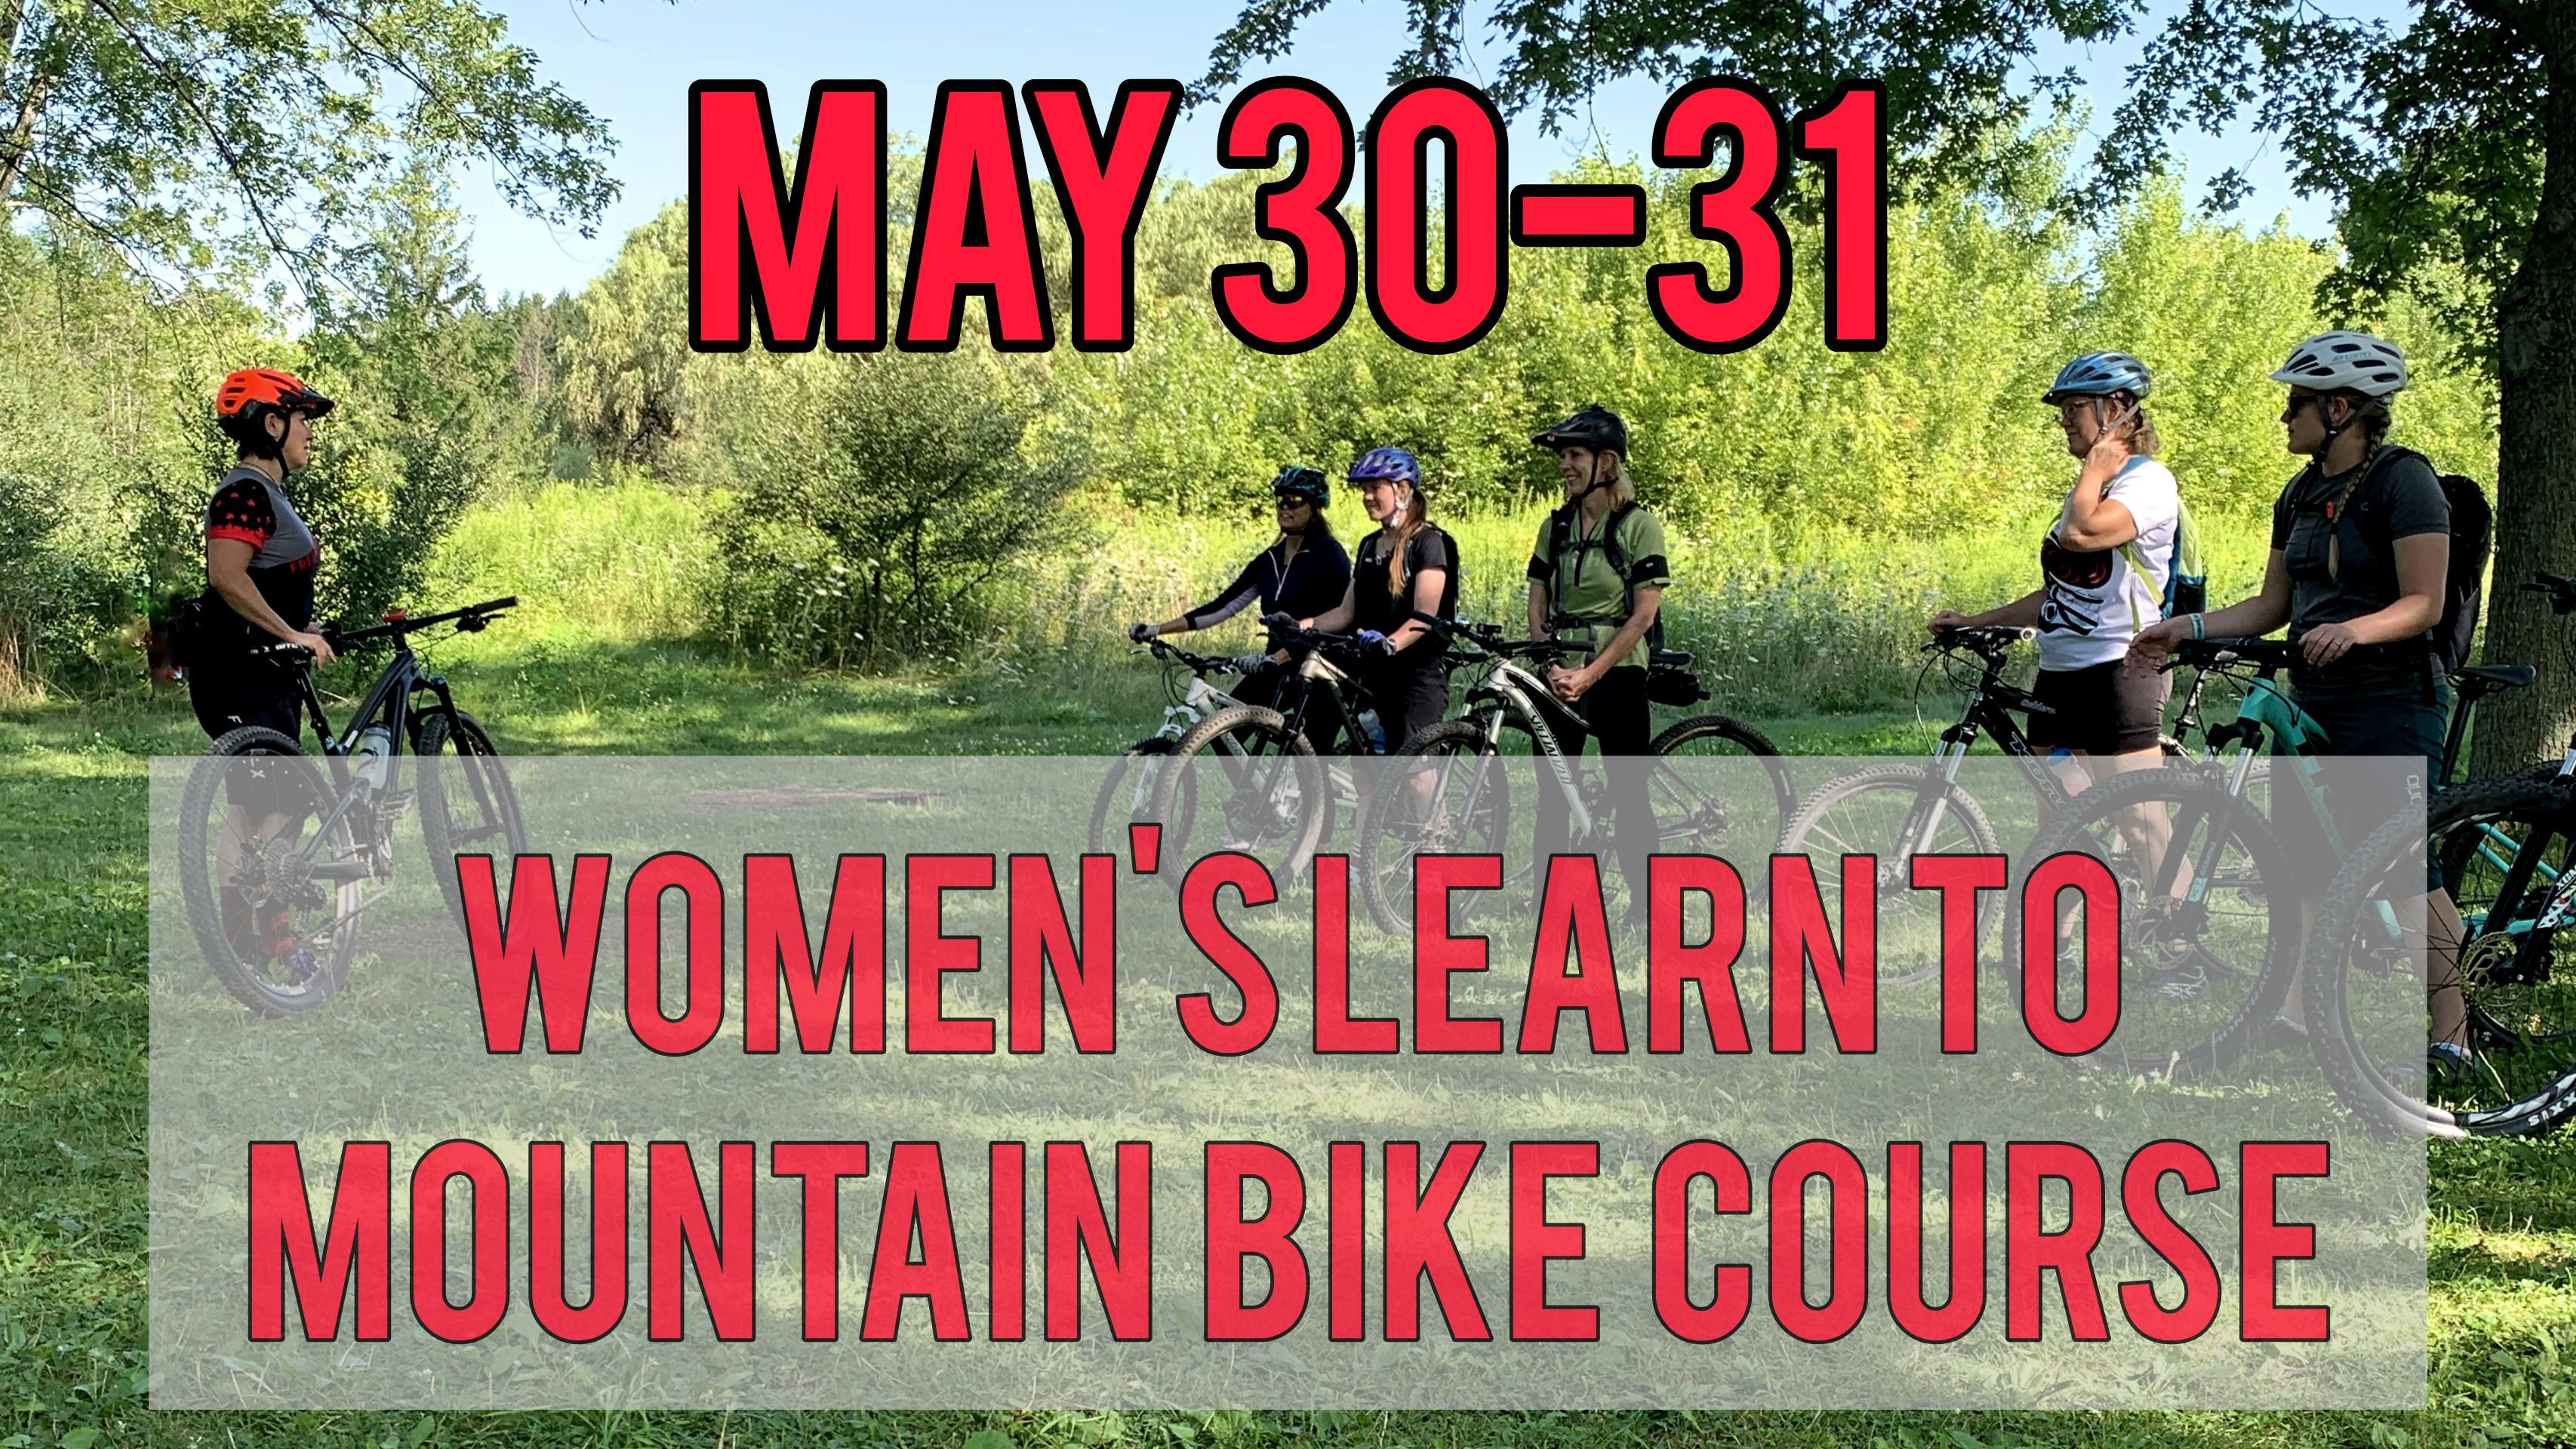 2020 Women's Learn To Mountain Bike Course